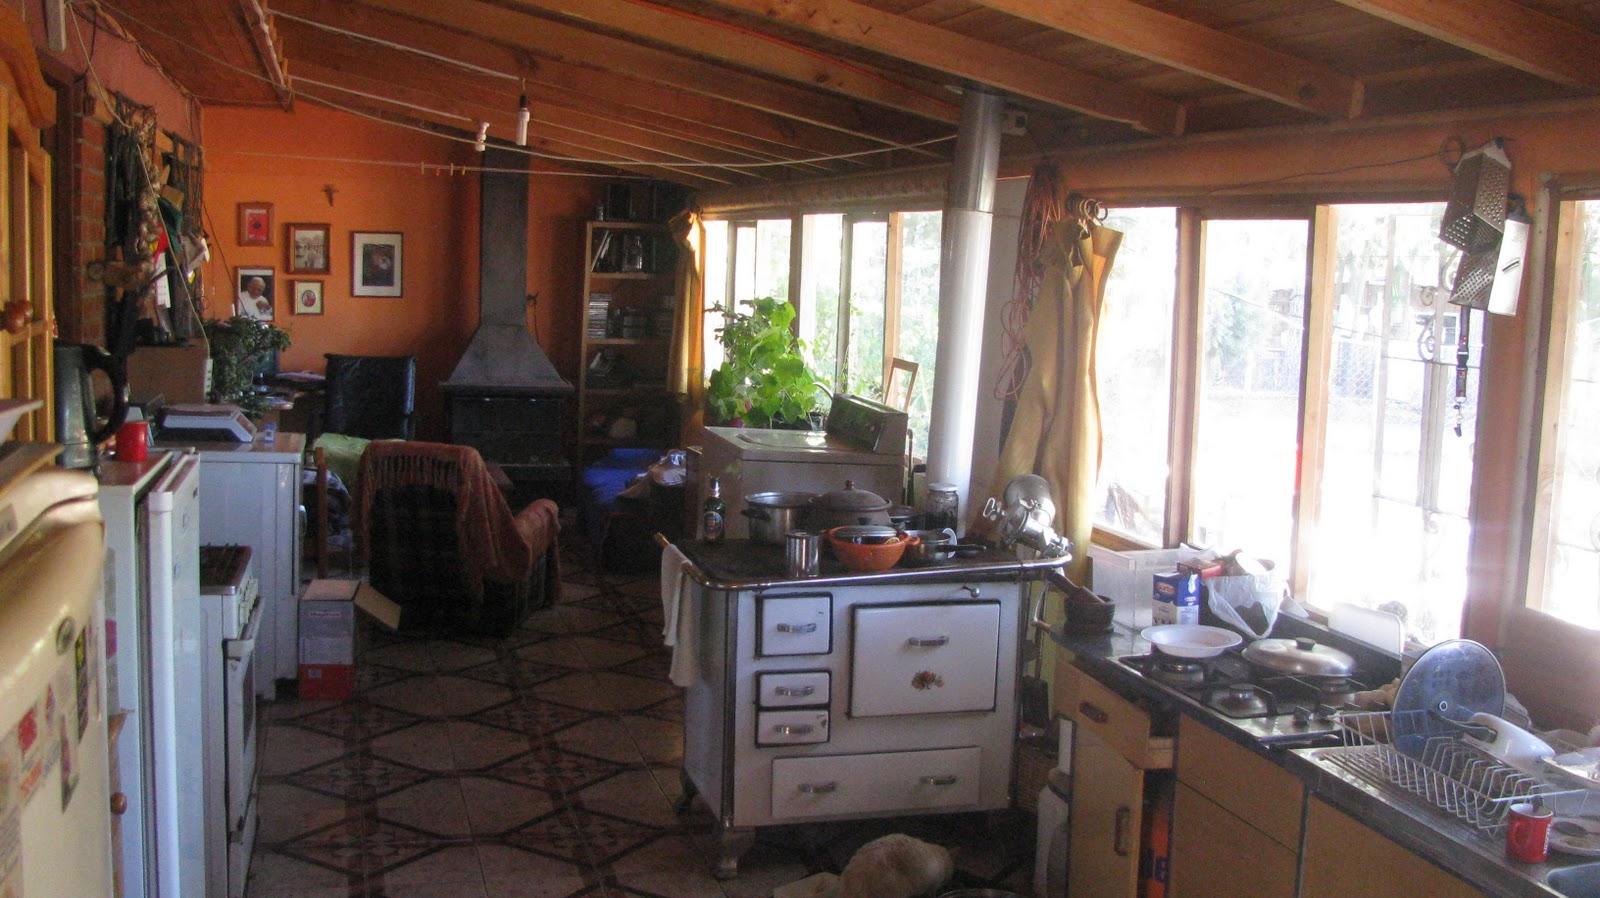 Terapeuta javier medina for Cocinas de fundicion a lena